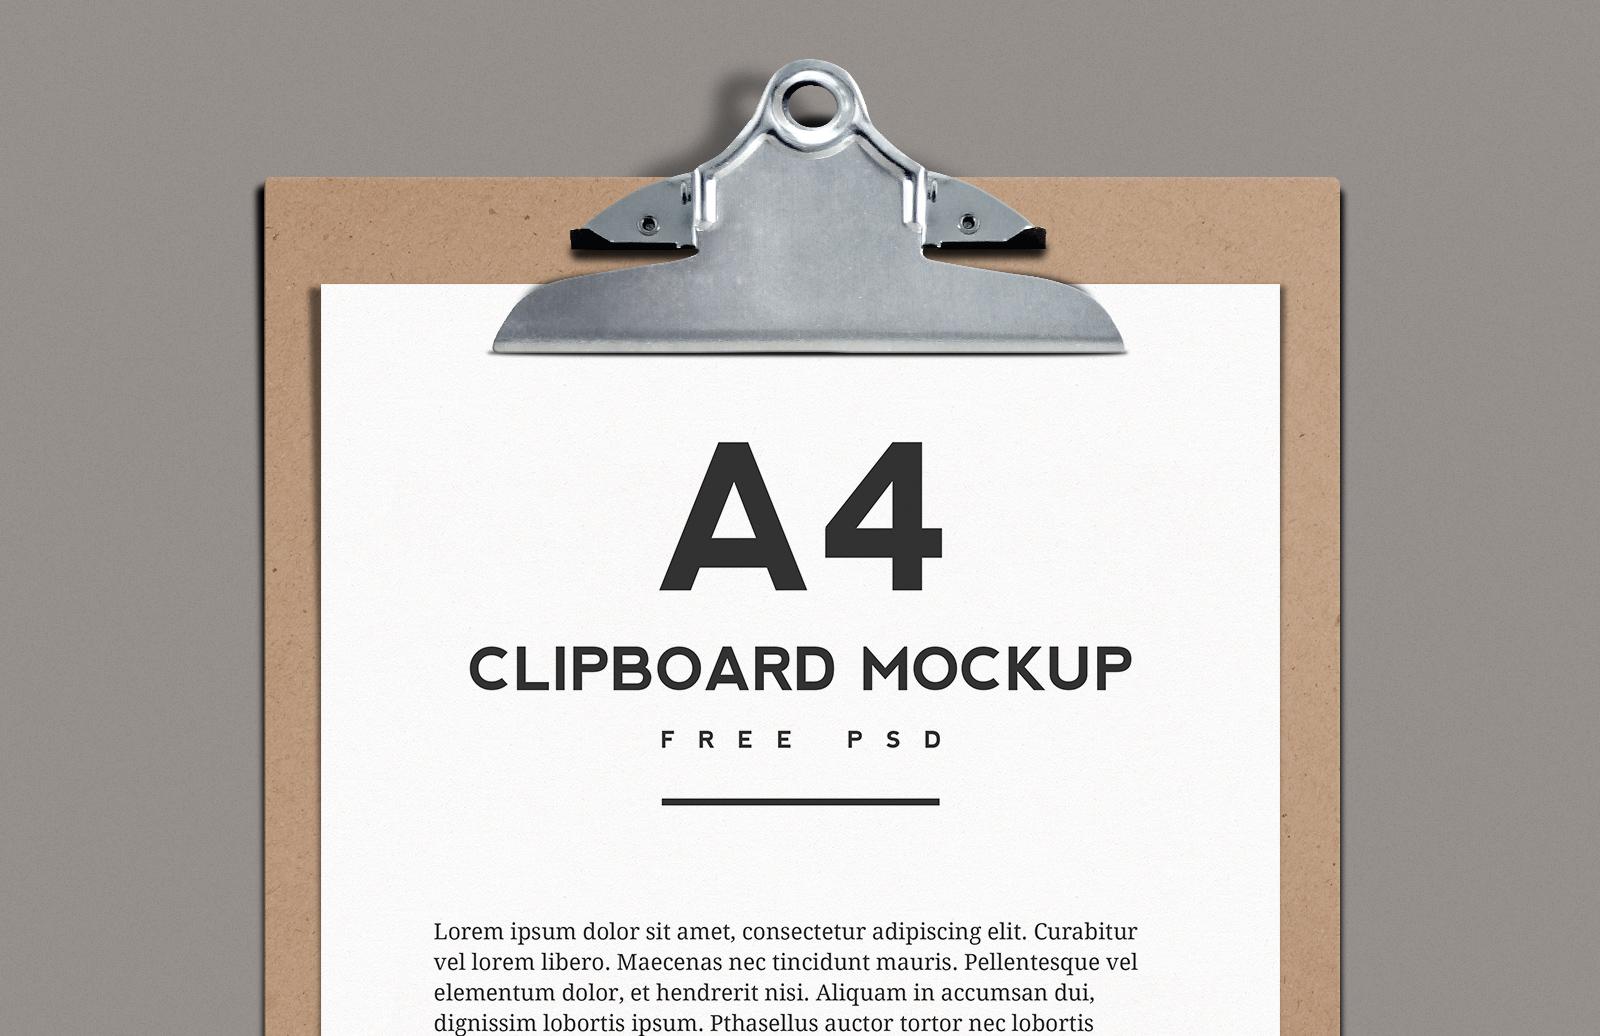 A4 Clipboard Mockup